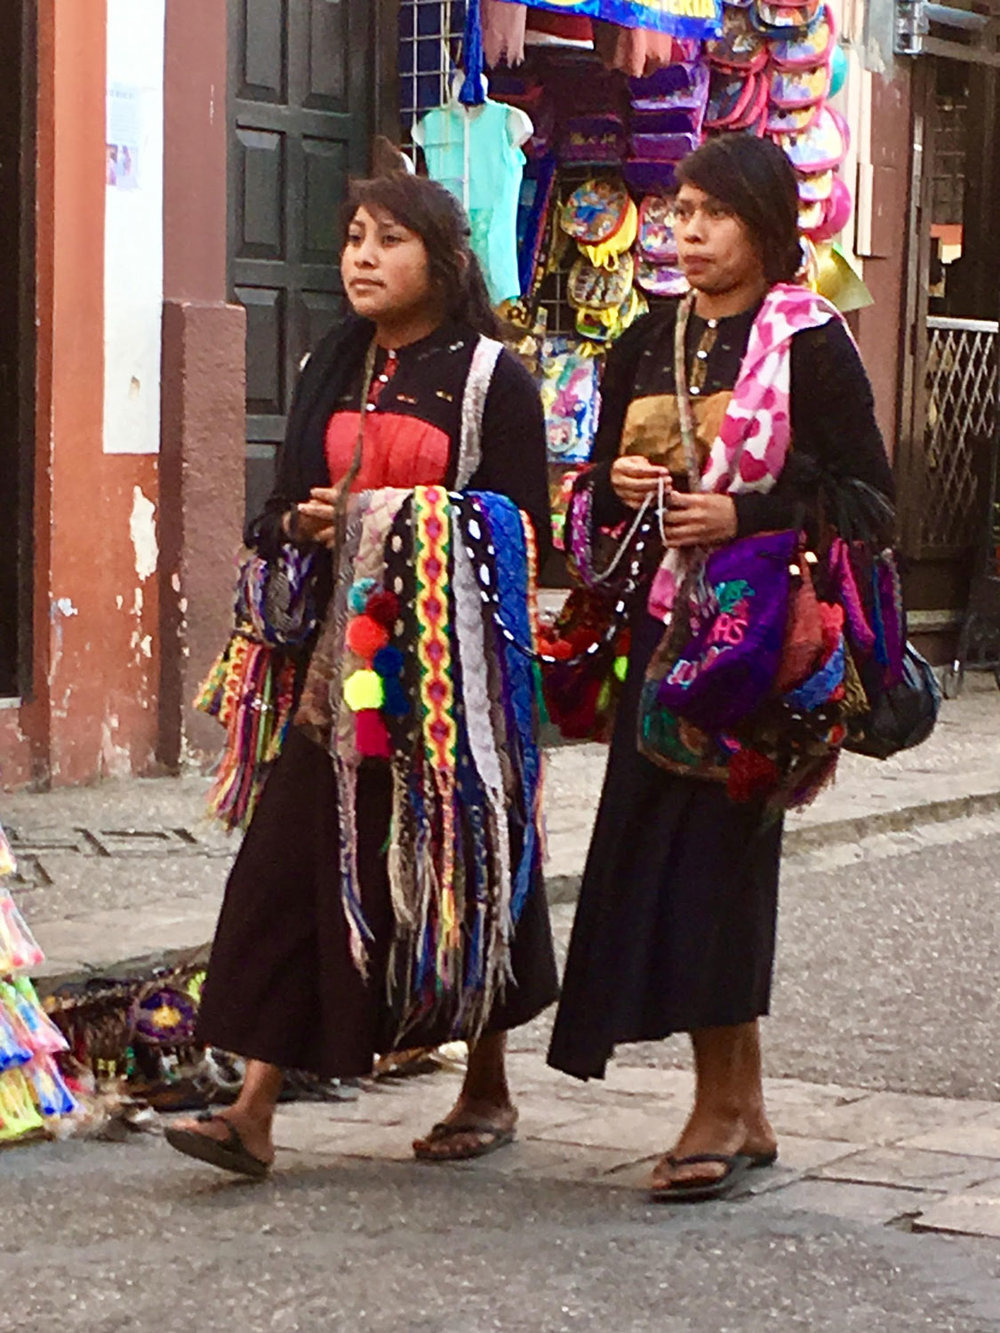 Hammocks_and_Ruins_Town_Villages_Chiapas_San_Cristobal_de_las_Casas_31.jpg